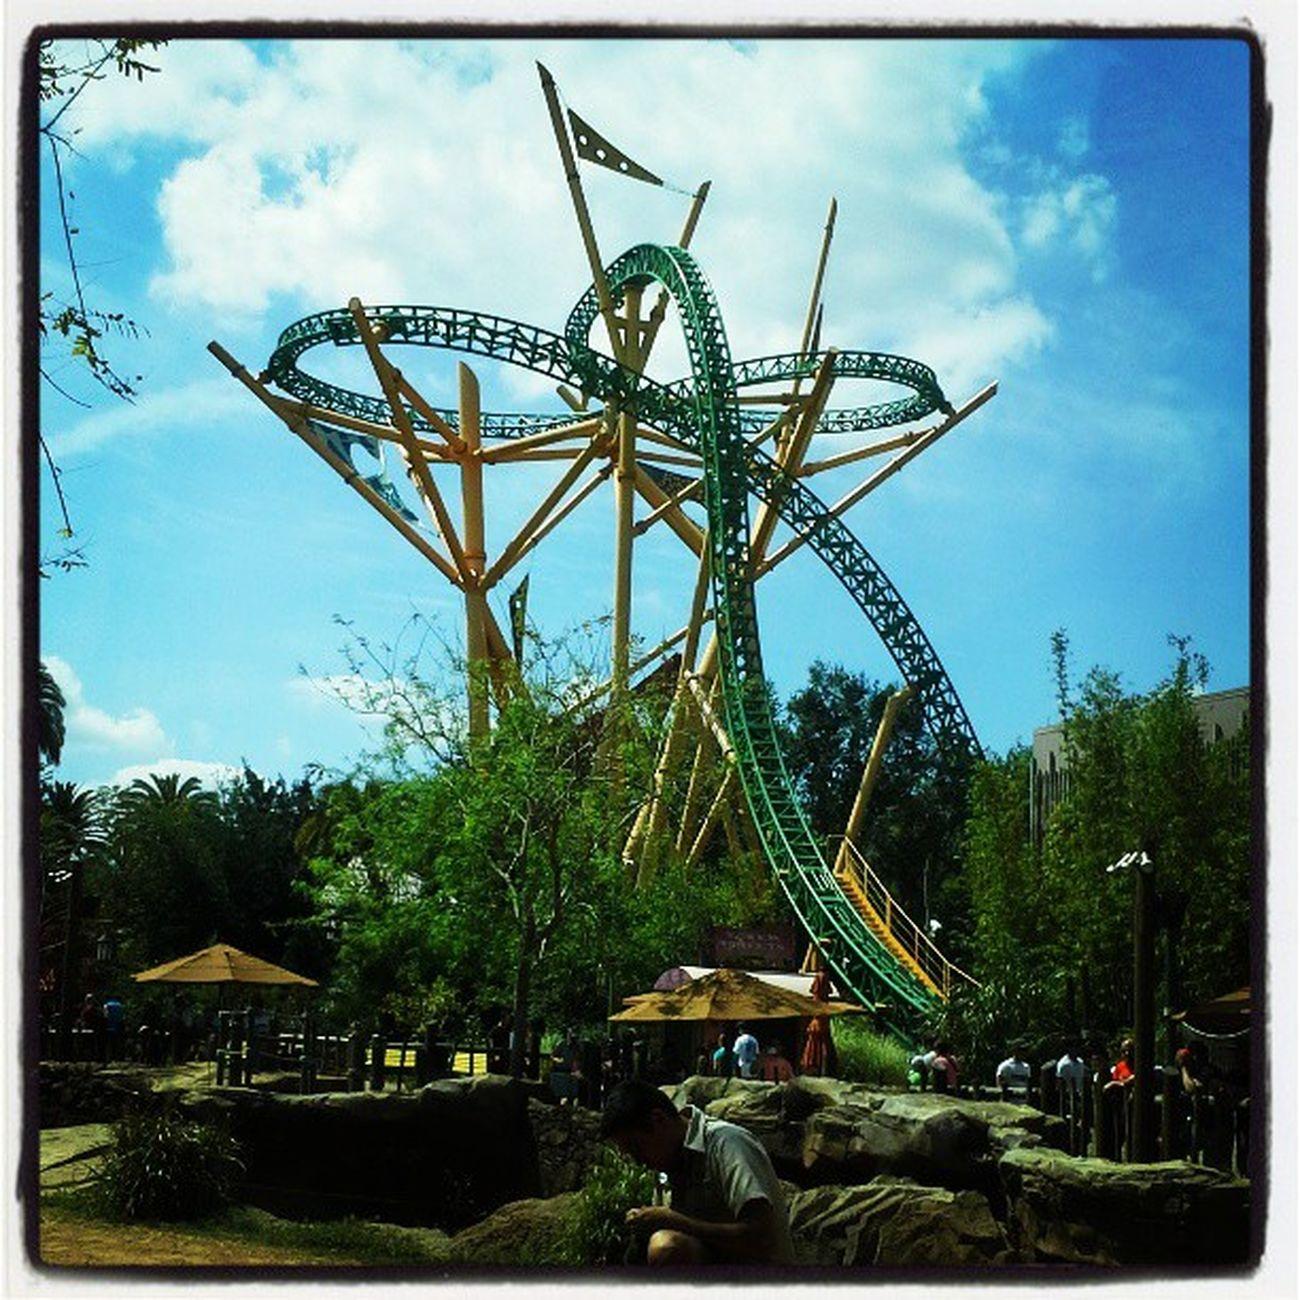 #Coaster #rollercoaster #Busch #Florida #tourist Tourist Florida Coaster Rollercoaster Busch Pixoddinary Pixoddinary_c6